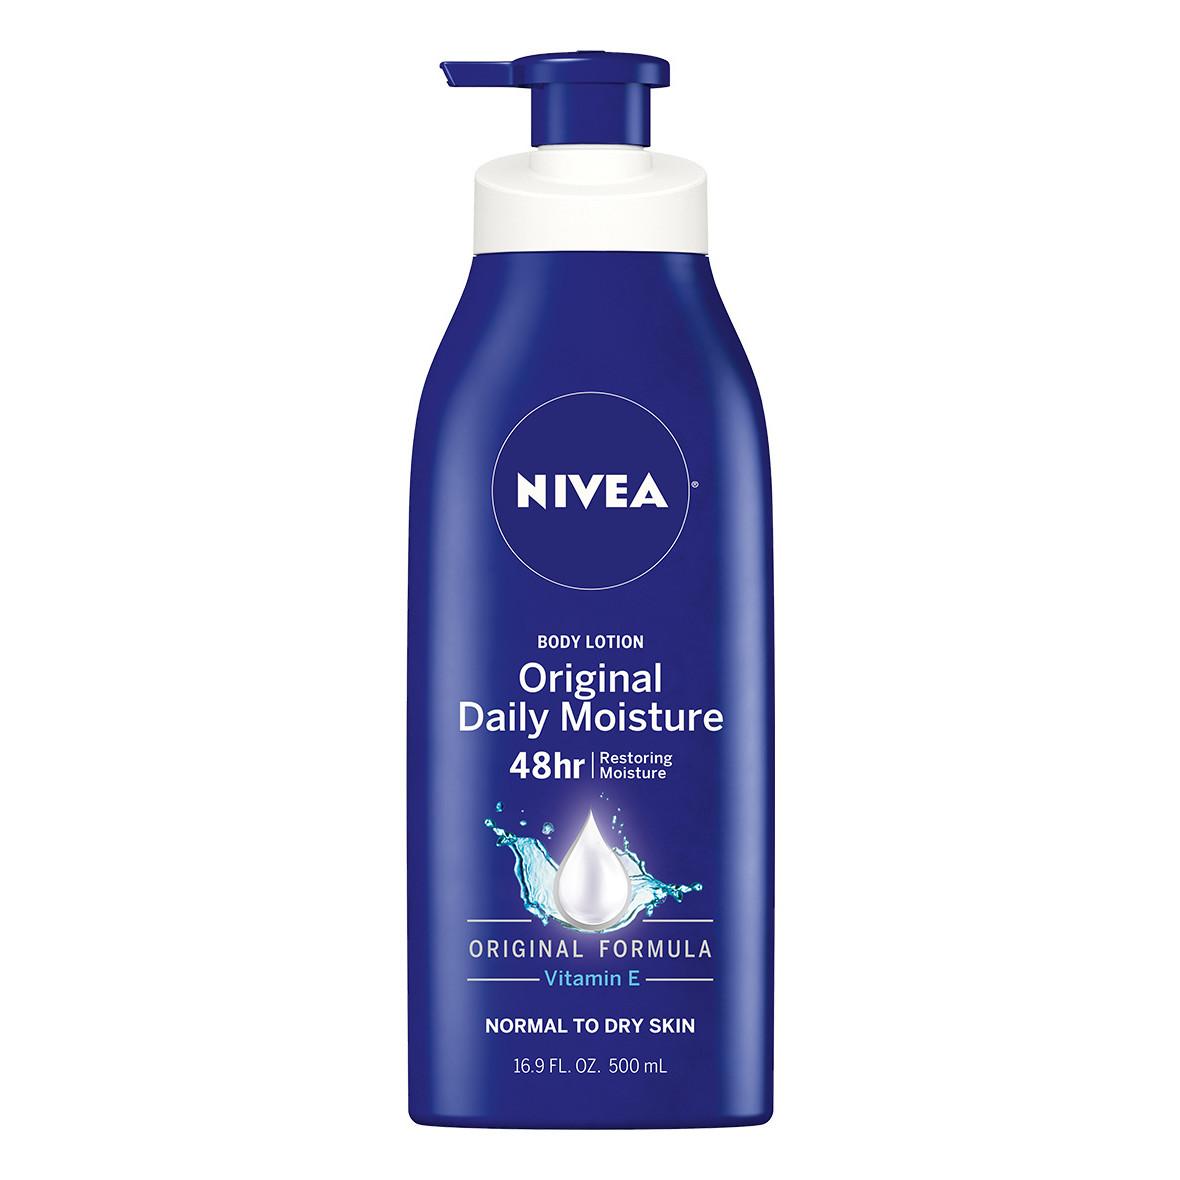 NIVEA Original Daily Moisture Body Lotion 16.9 fl. oz.